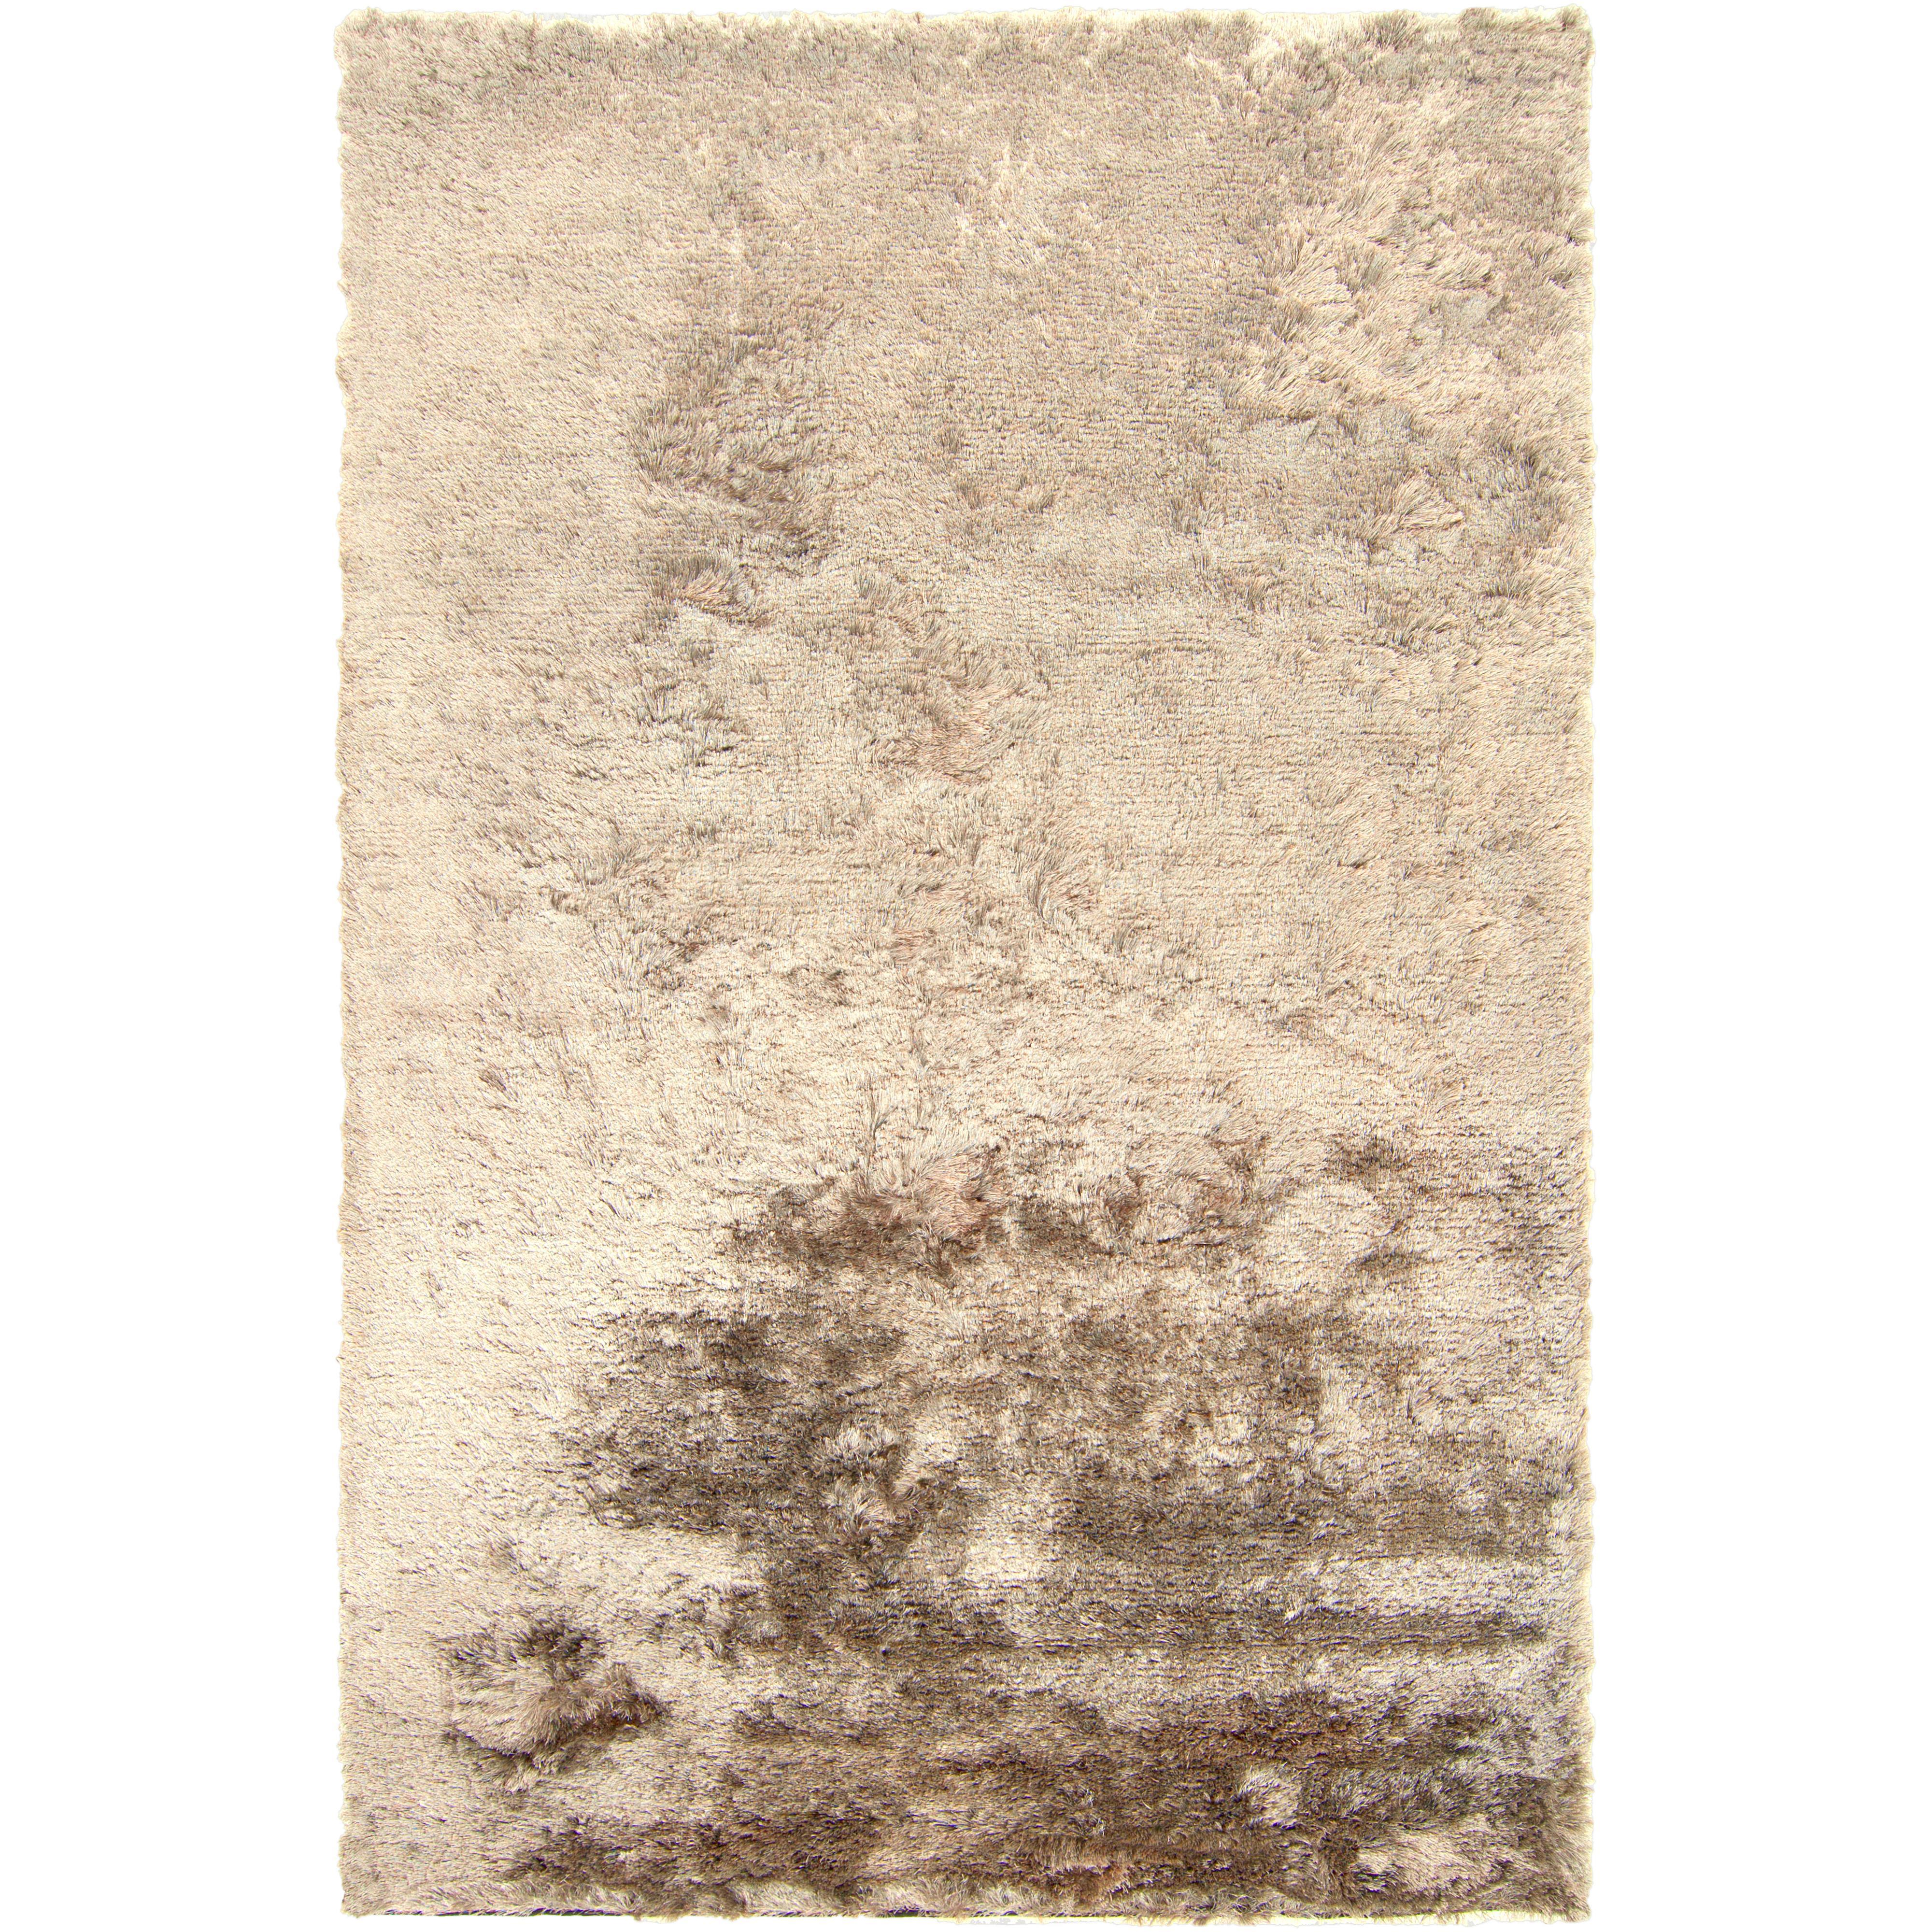 Surya Rugs Jasper 8' x 11' - Item Number: JSP8005-811